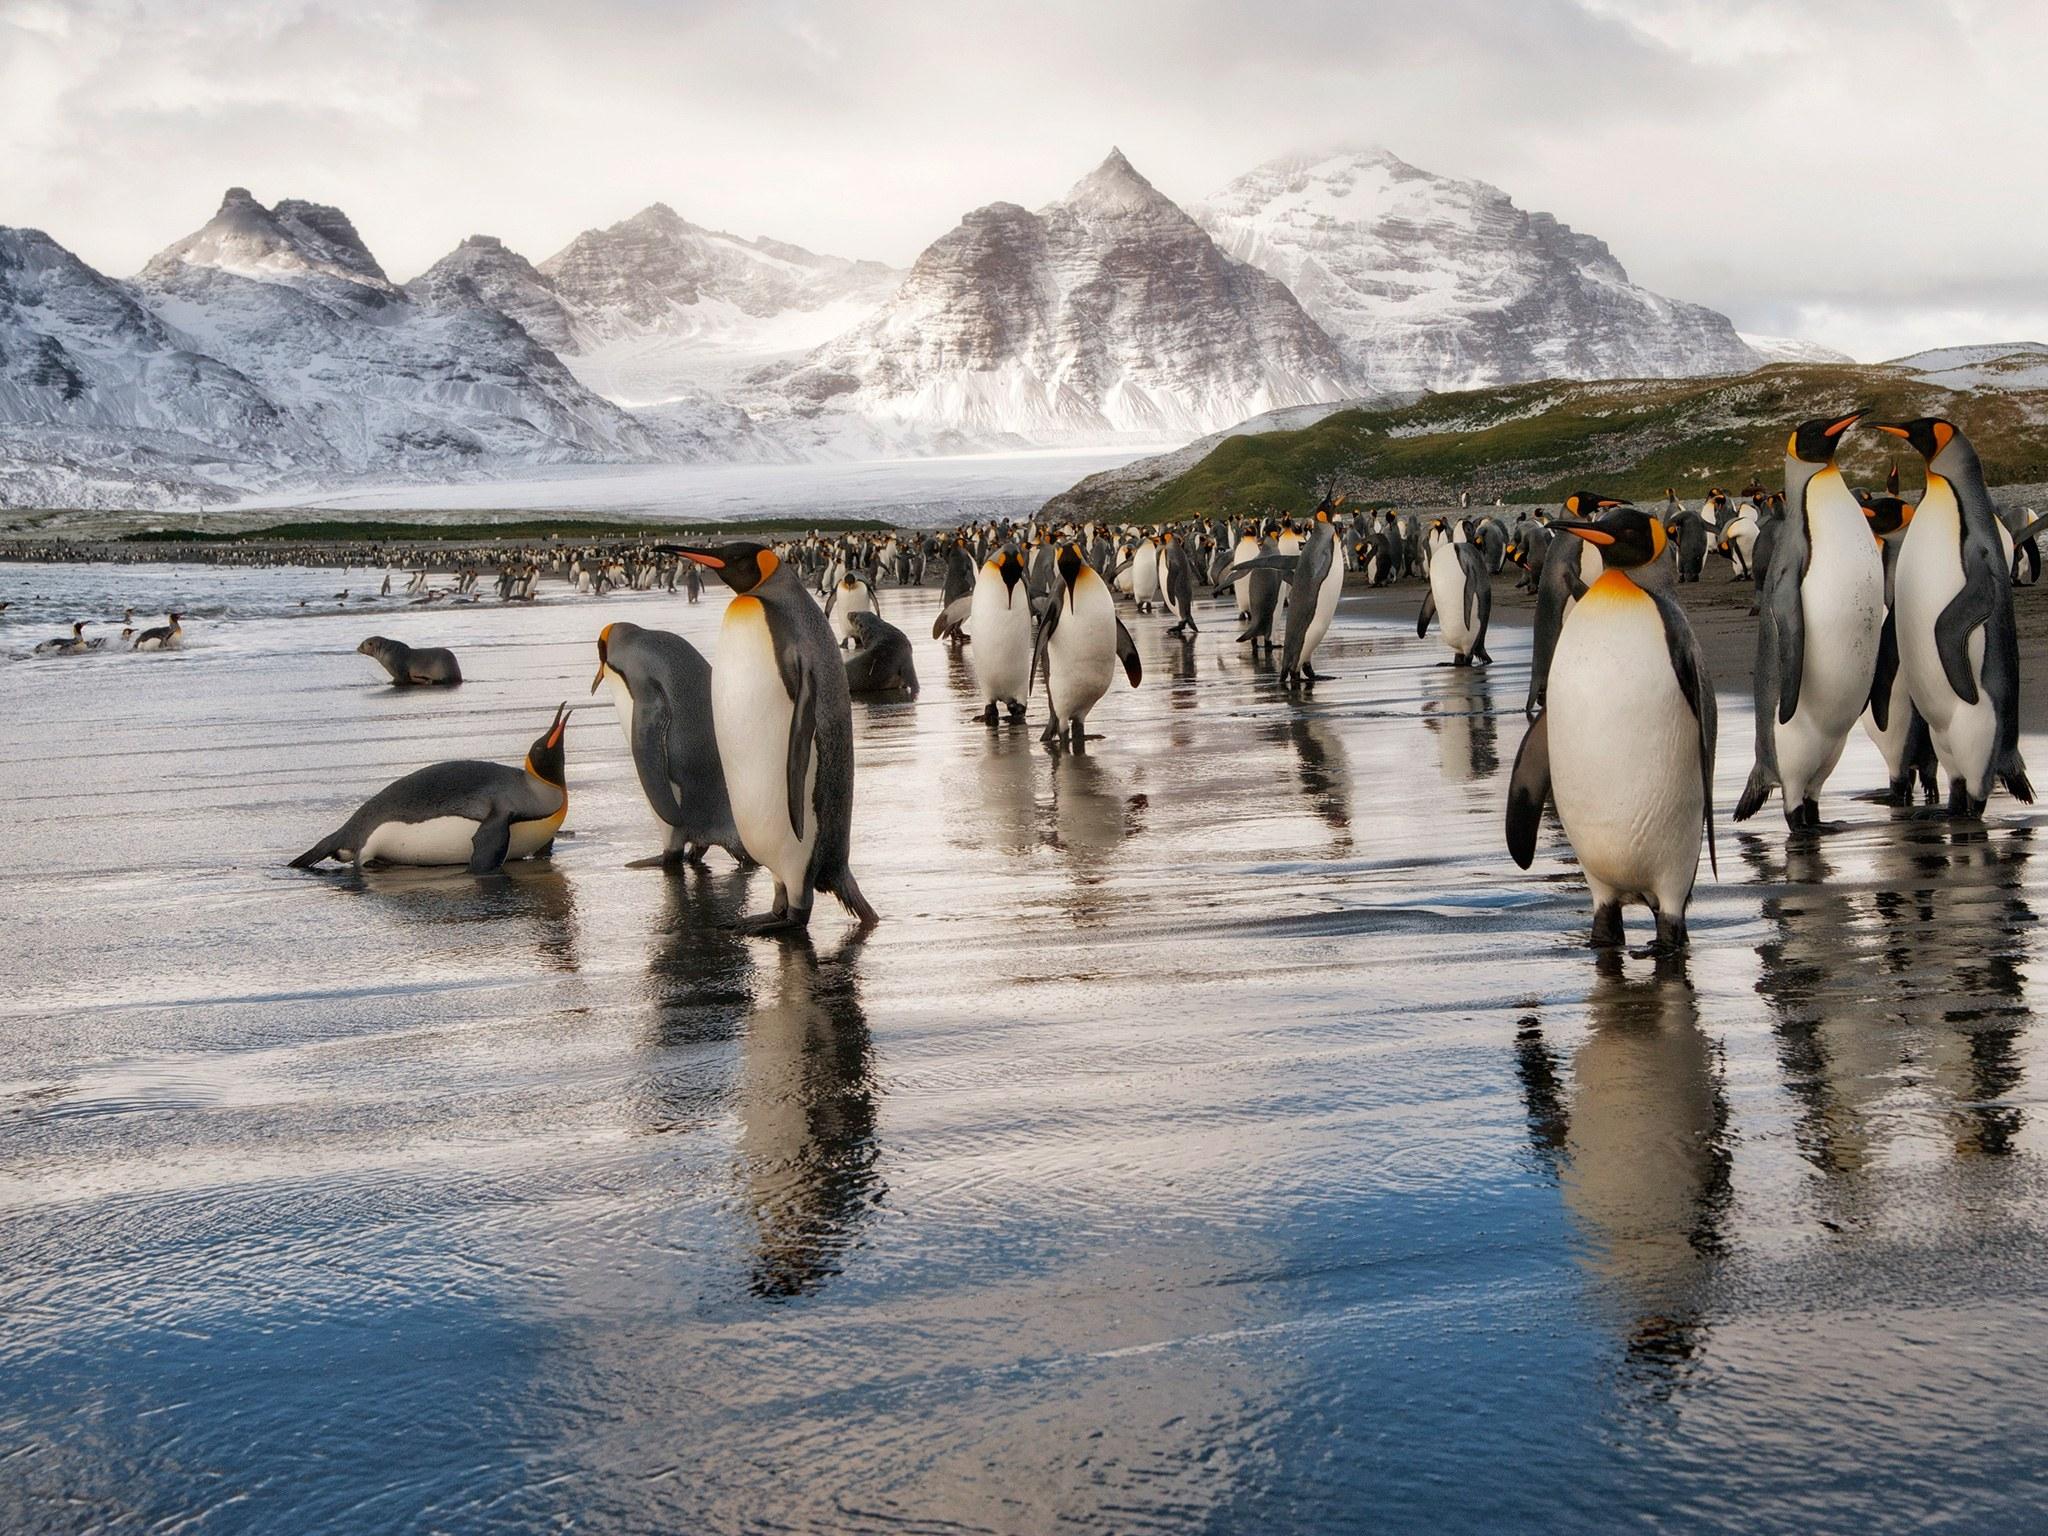 Уникальное ледовое царство Антарктиды